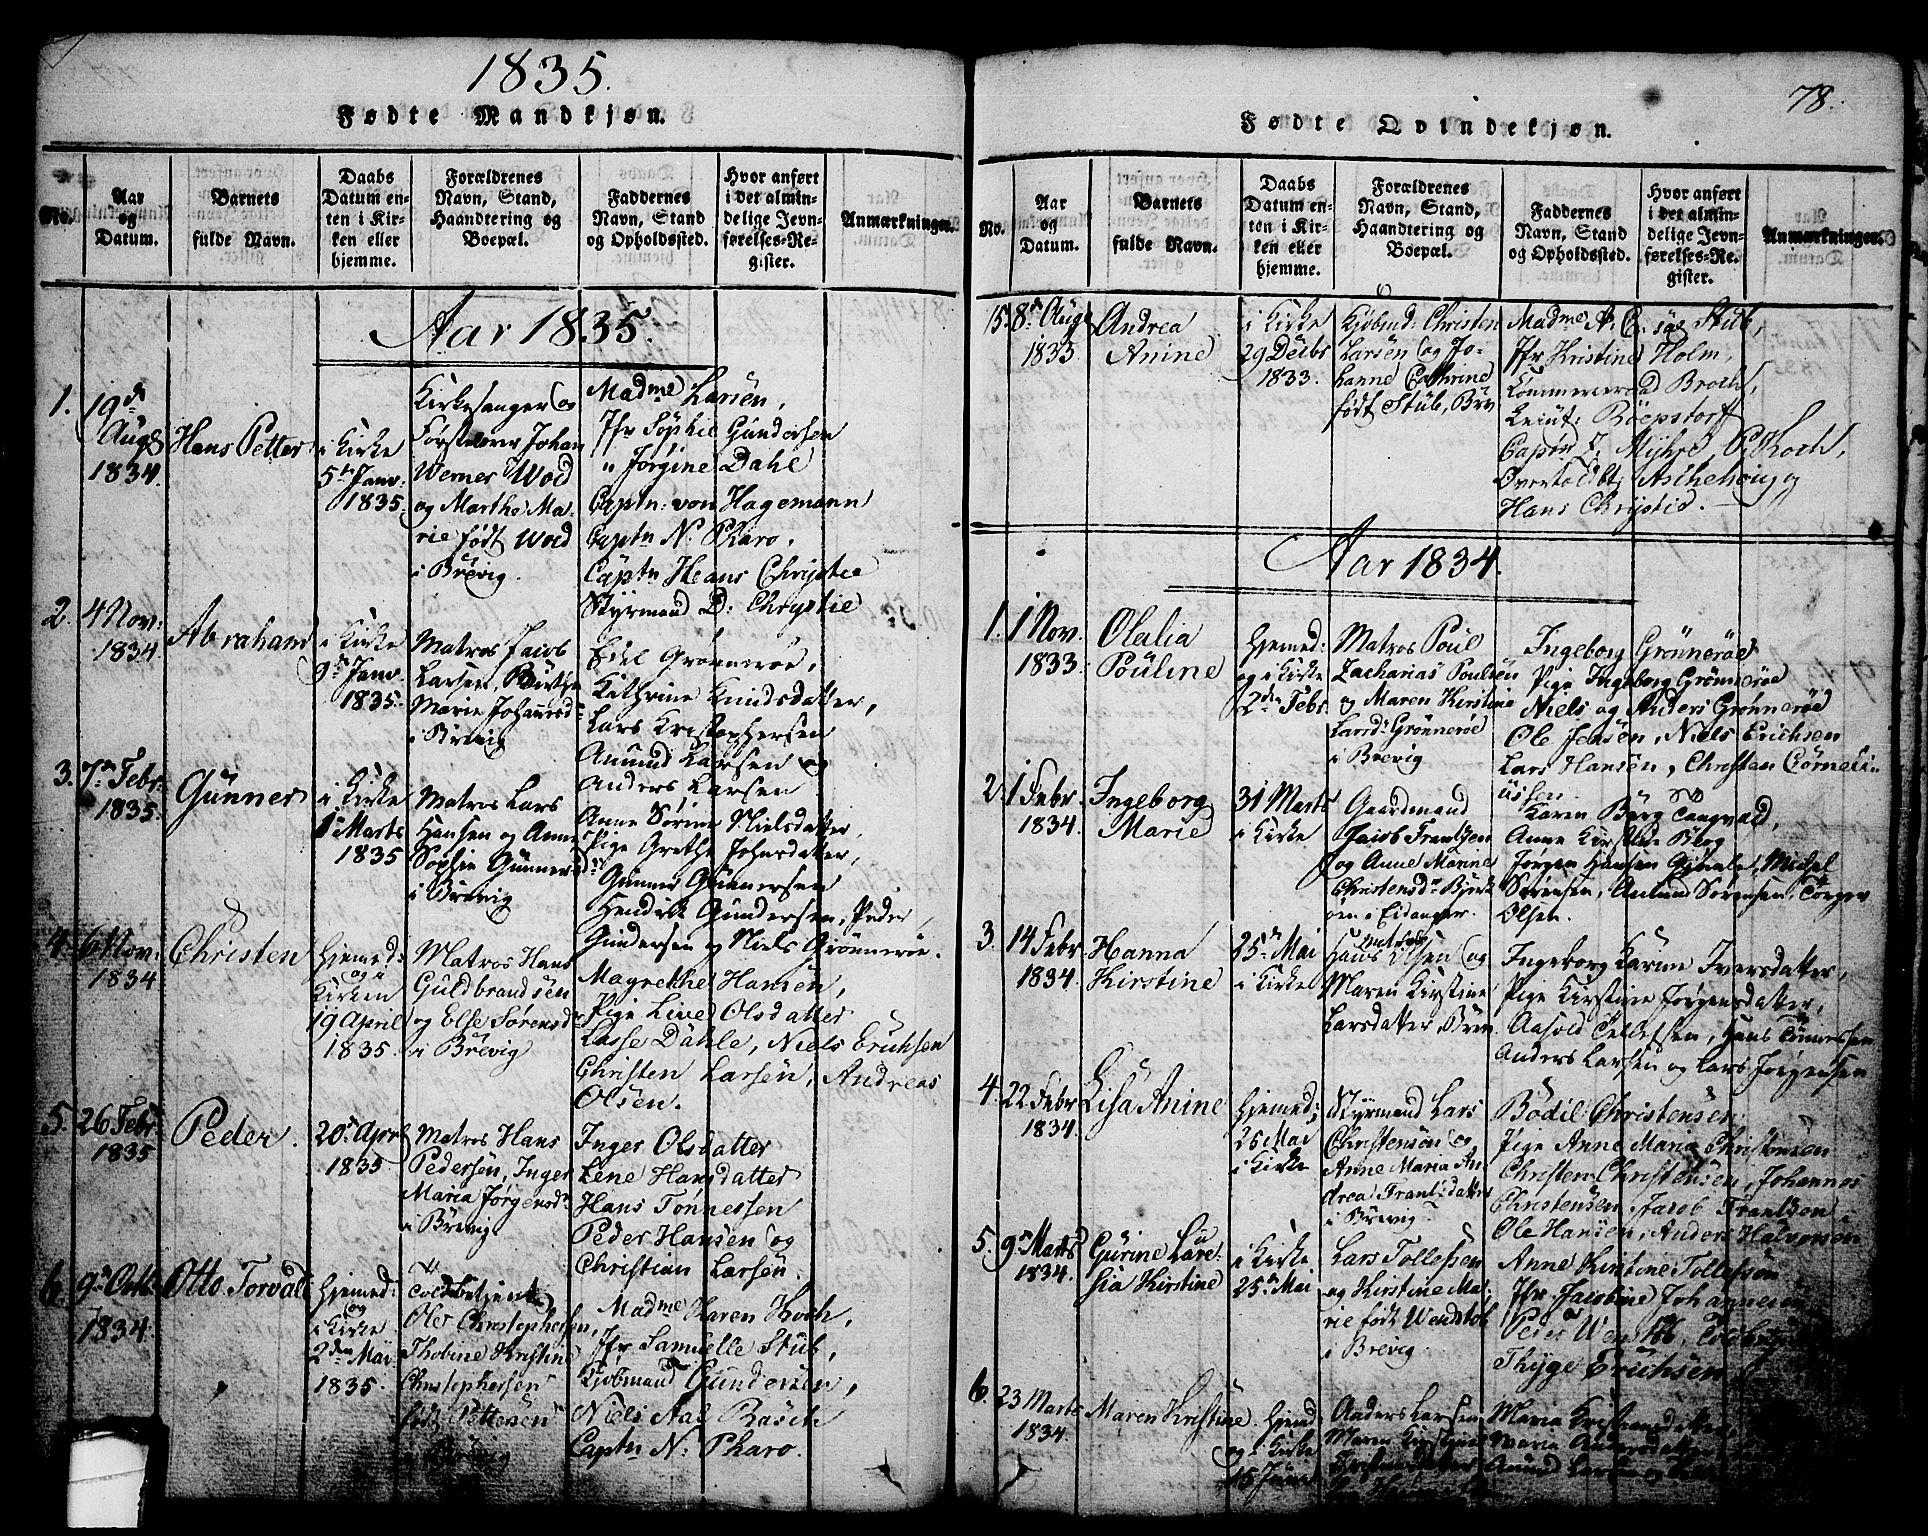 SAKO, Brevik kirkebøker, G/Ga/L0001: Klokkerbok nr. 1, 1814-1845, s. 78